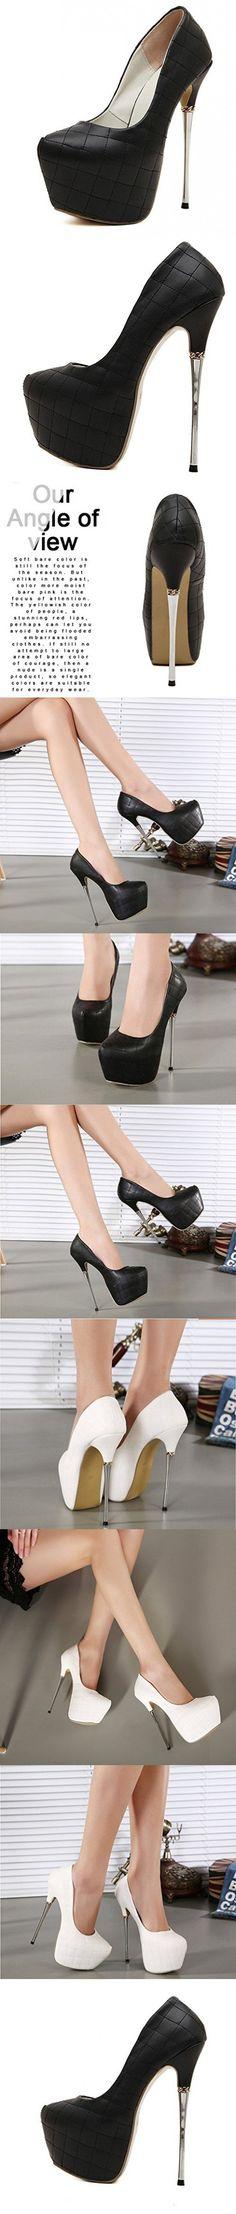 Sexy women shoes high heel wedding shoes platform ultra high heels 17cm air pumps round toe platform genuine leather stiletto